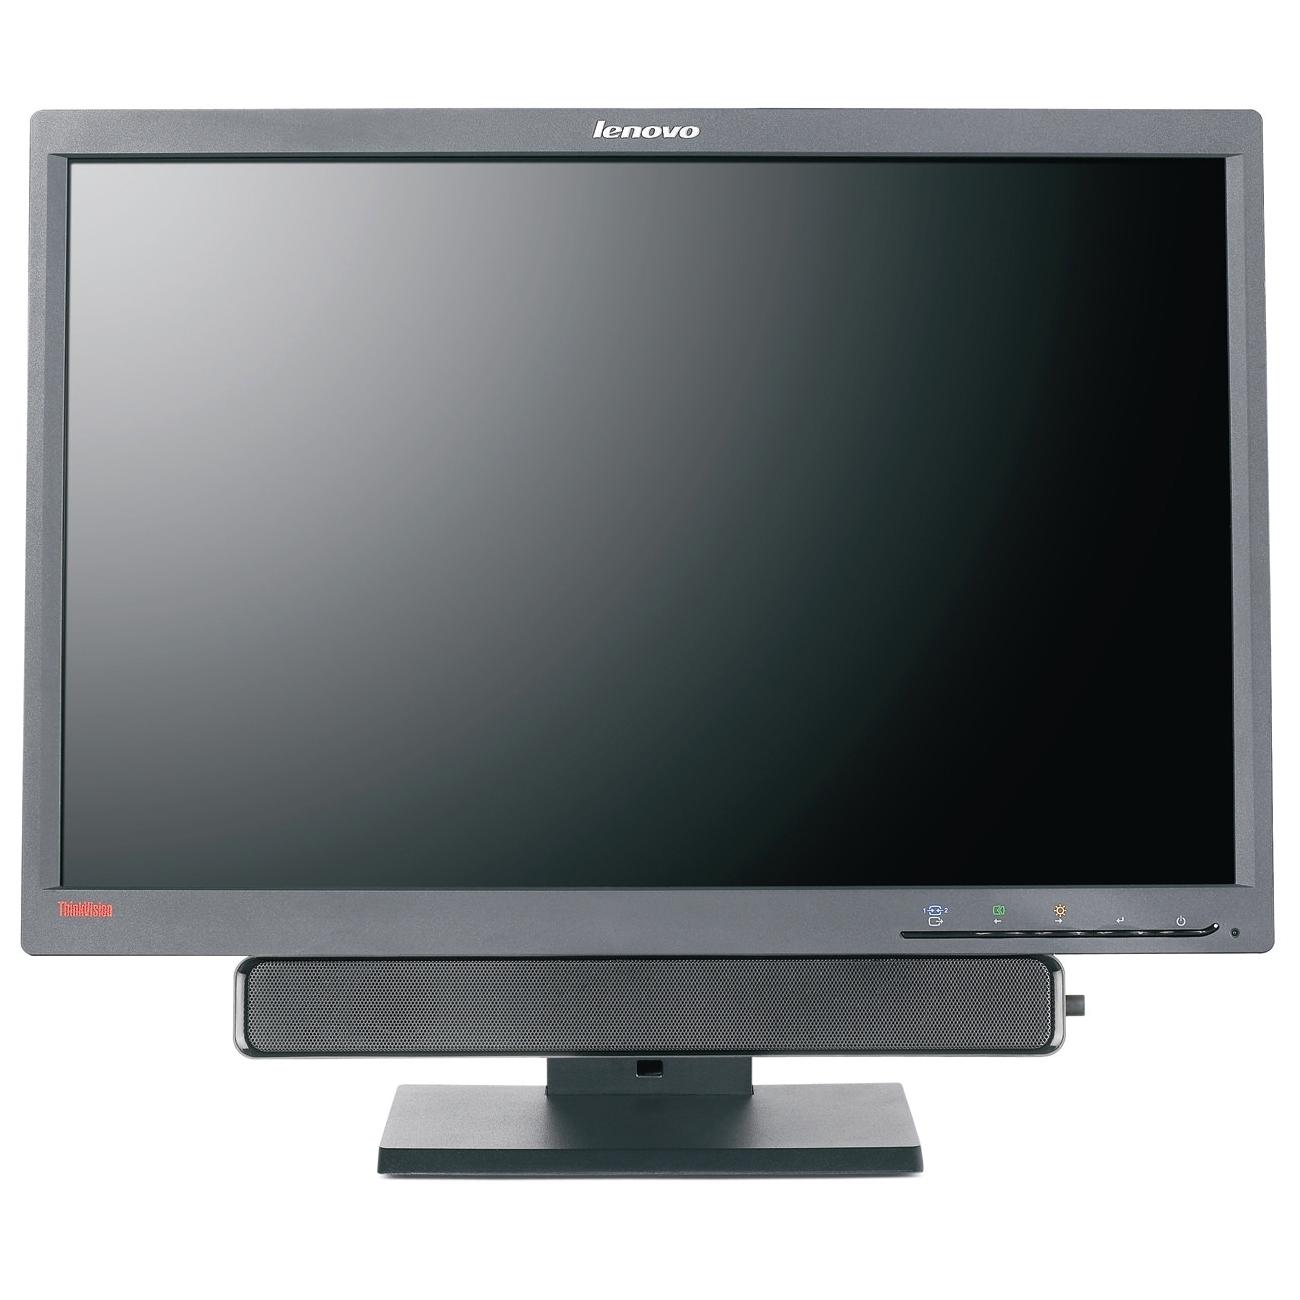 22 Lenovo ThinkVision L2250P 2572-HB6 WideScreen 1680x1050 DVI VGA Black LCD Monitor 2572HB6